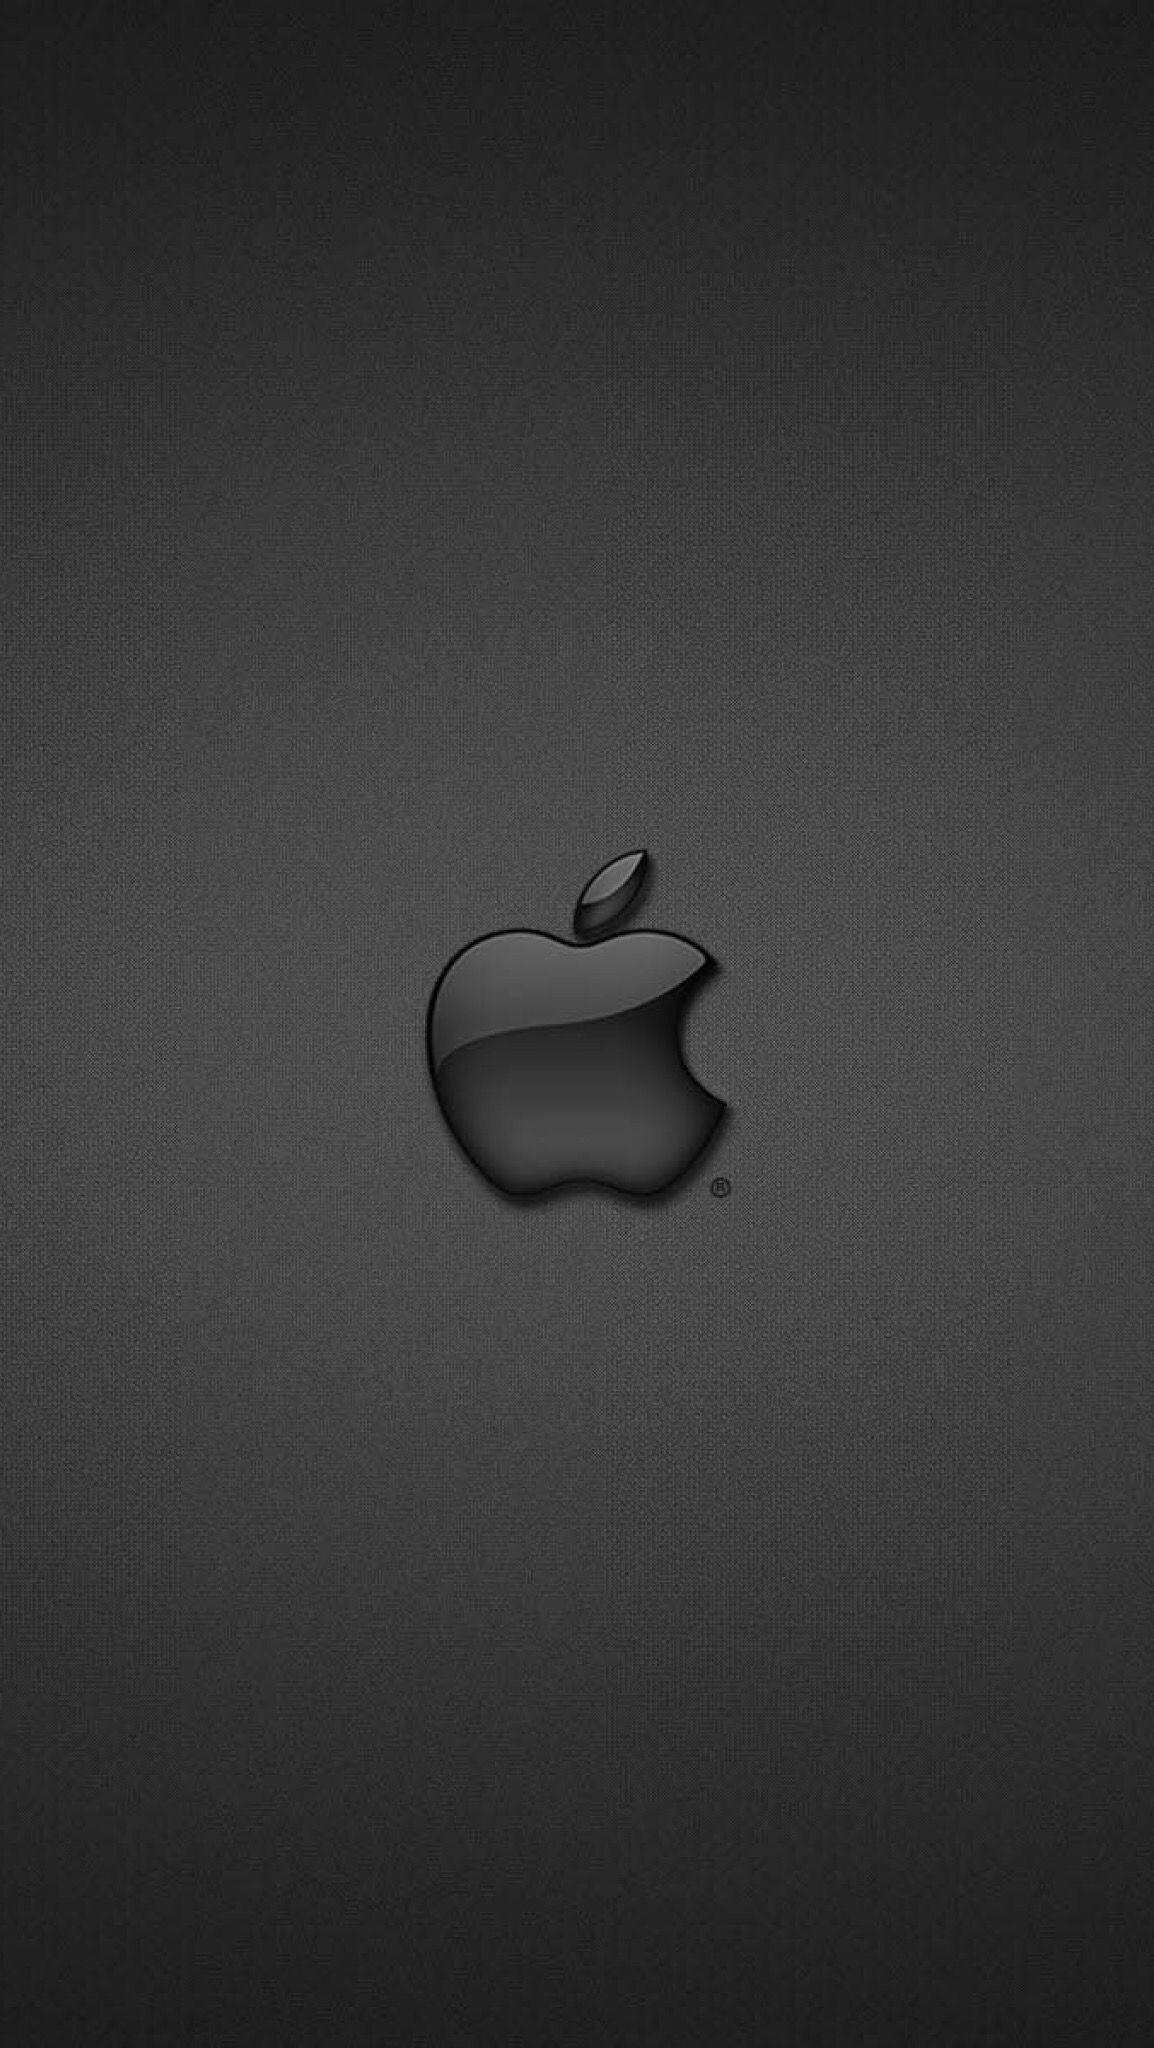 Download Cool Black Wallpaper For Iphone 2019 Apple Wallpaper Apple Logo Wallpaper Iphone Iphone Wallpaper Logo